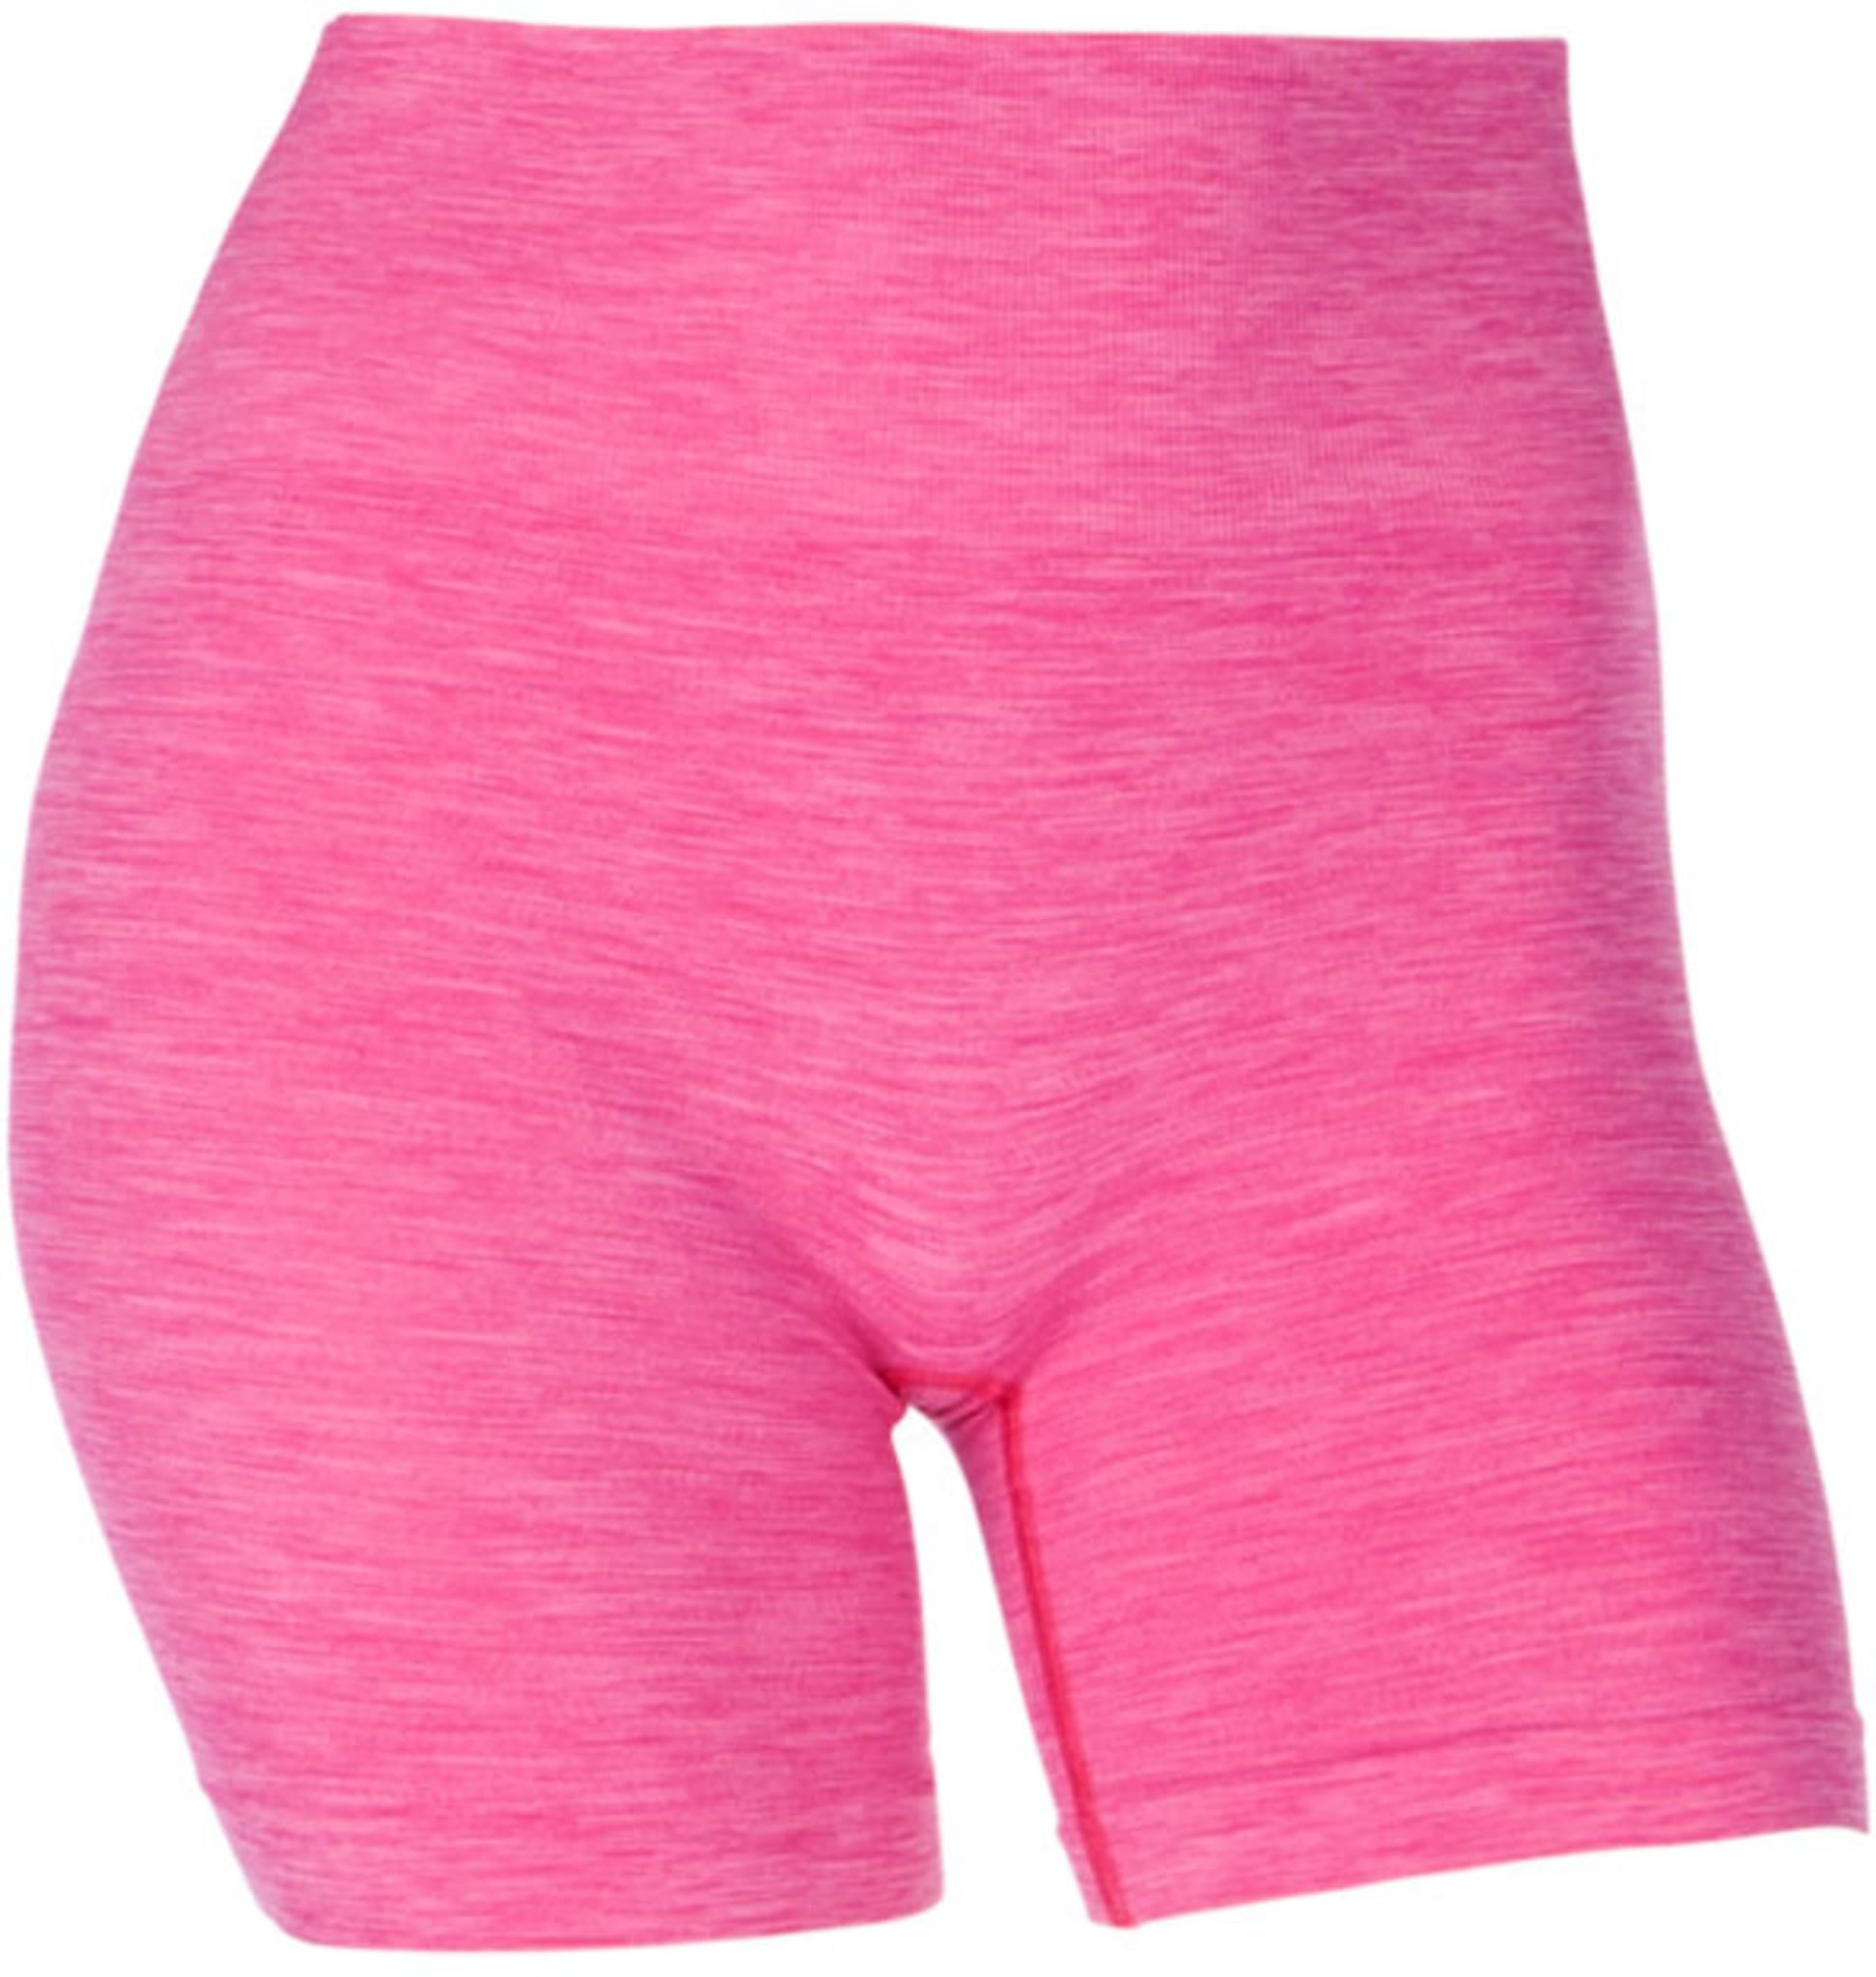 Bandha Yoga Shorts W